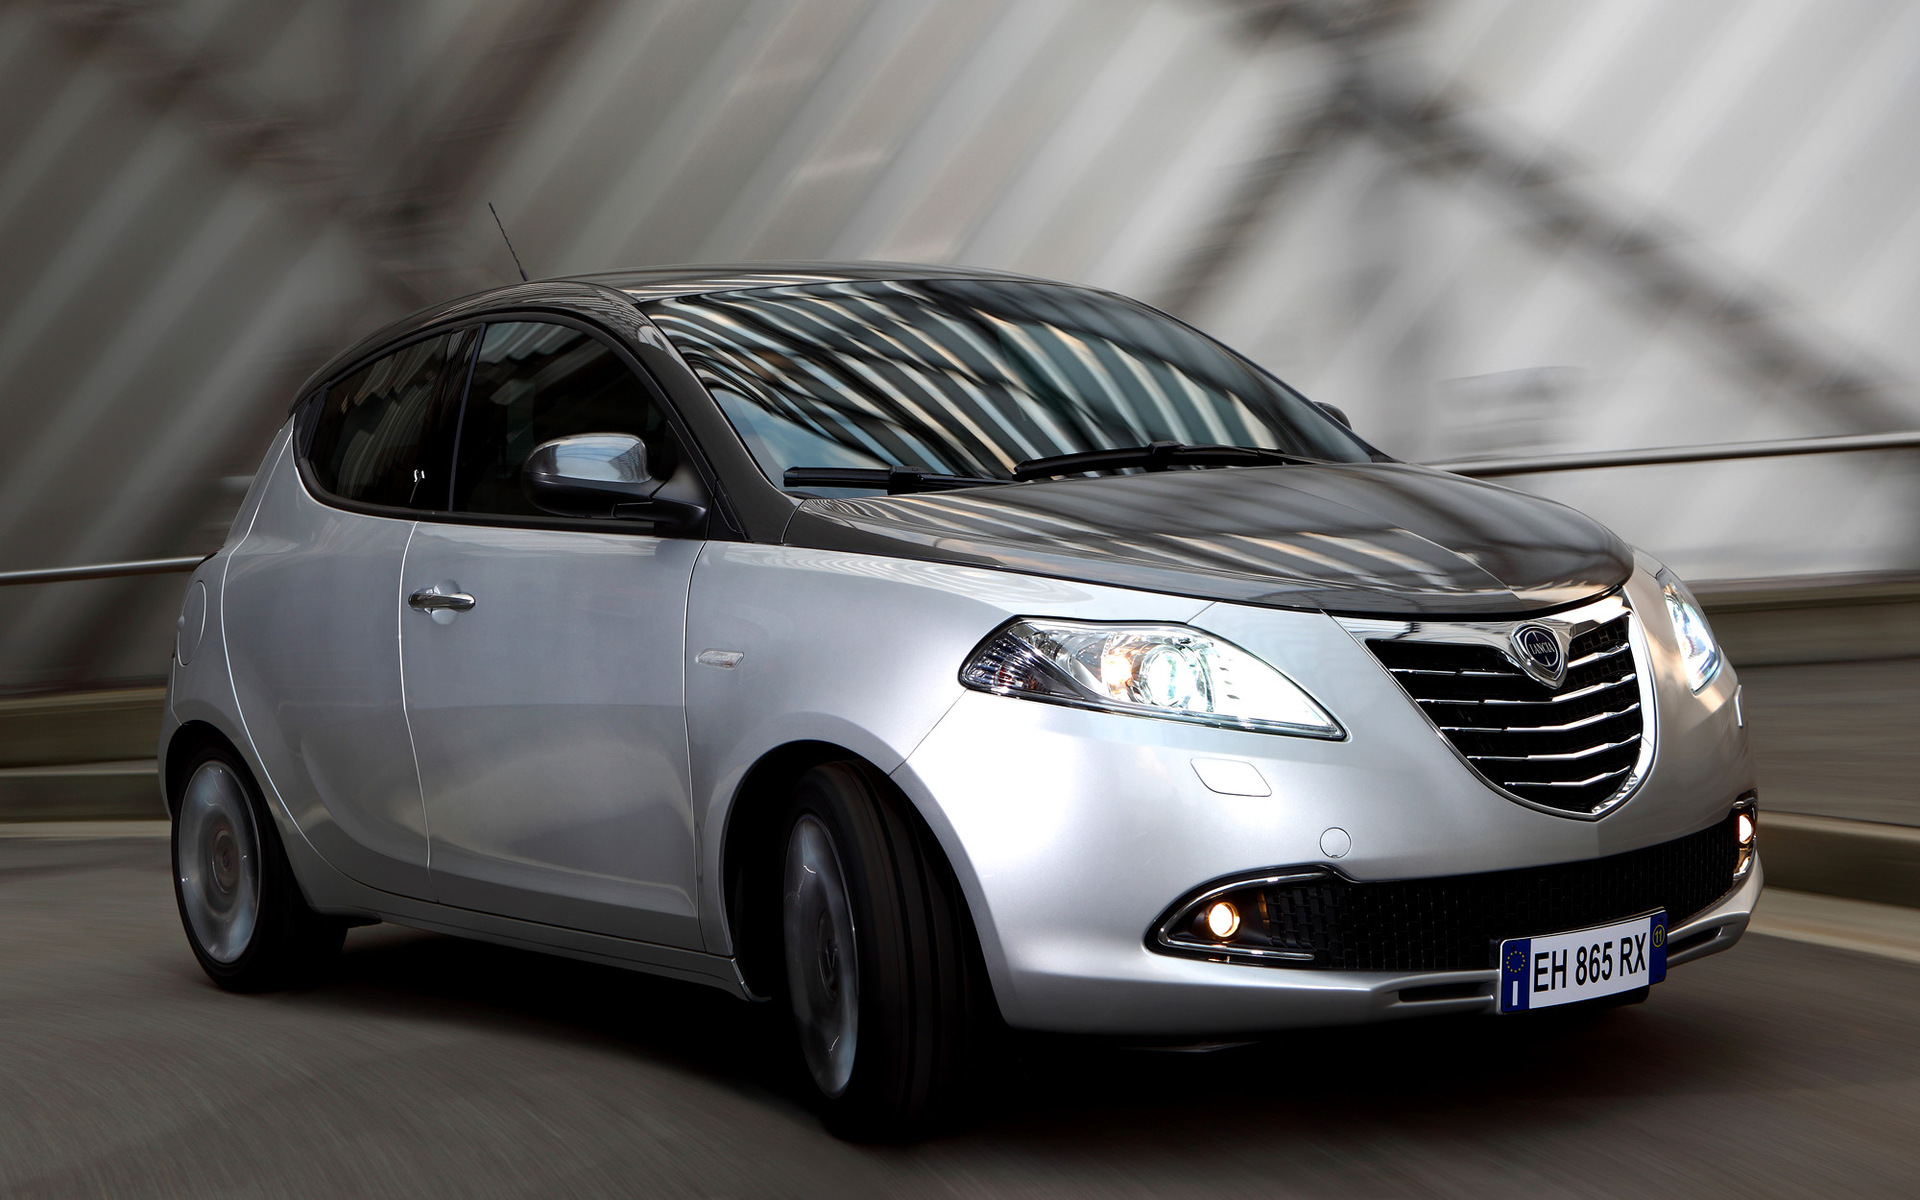 Lancia Ypsilon (2011) Wallpapers and HD Images - Car Pixel